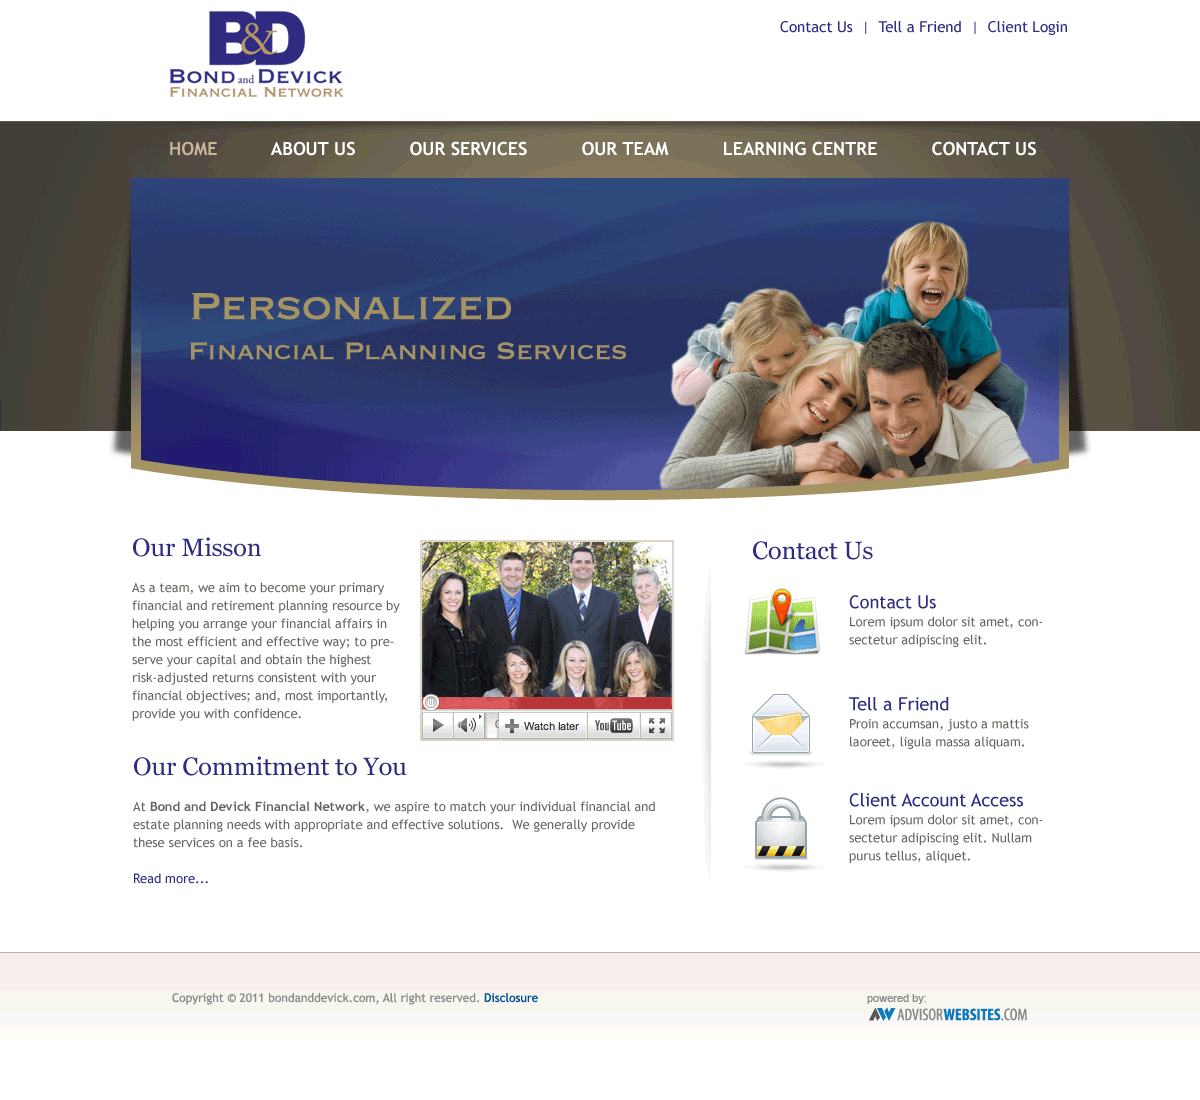 Web design trends on Financial Professionals' websites